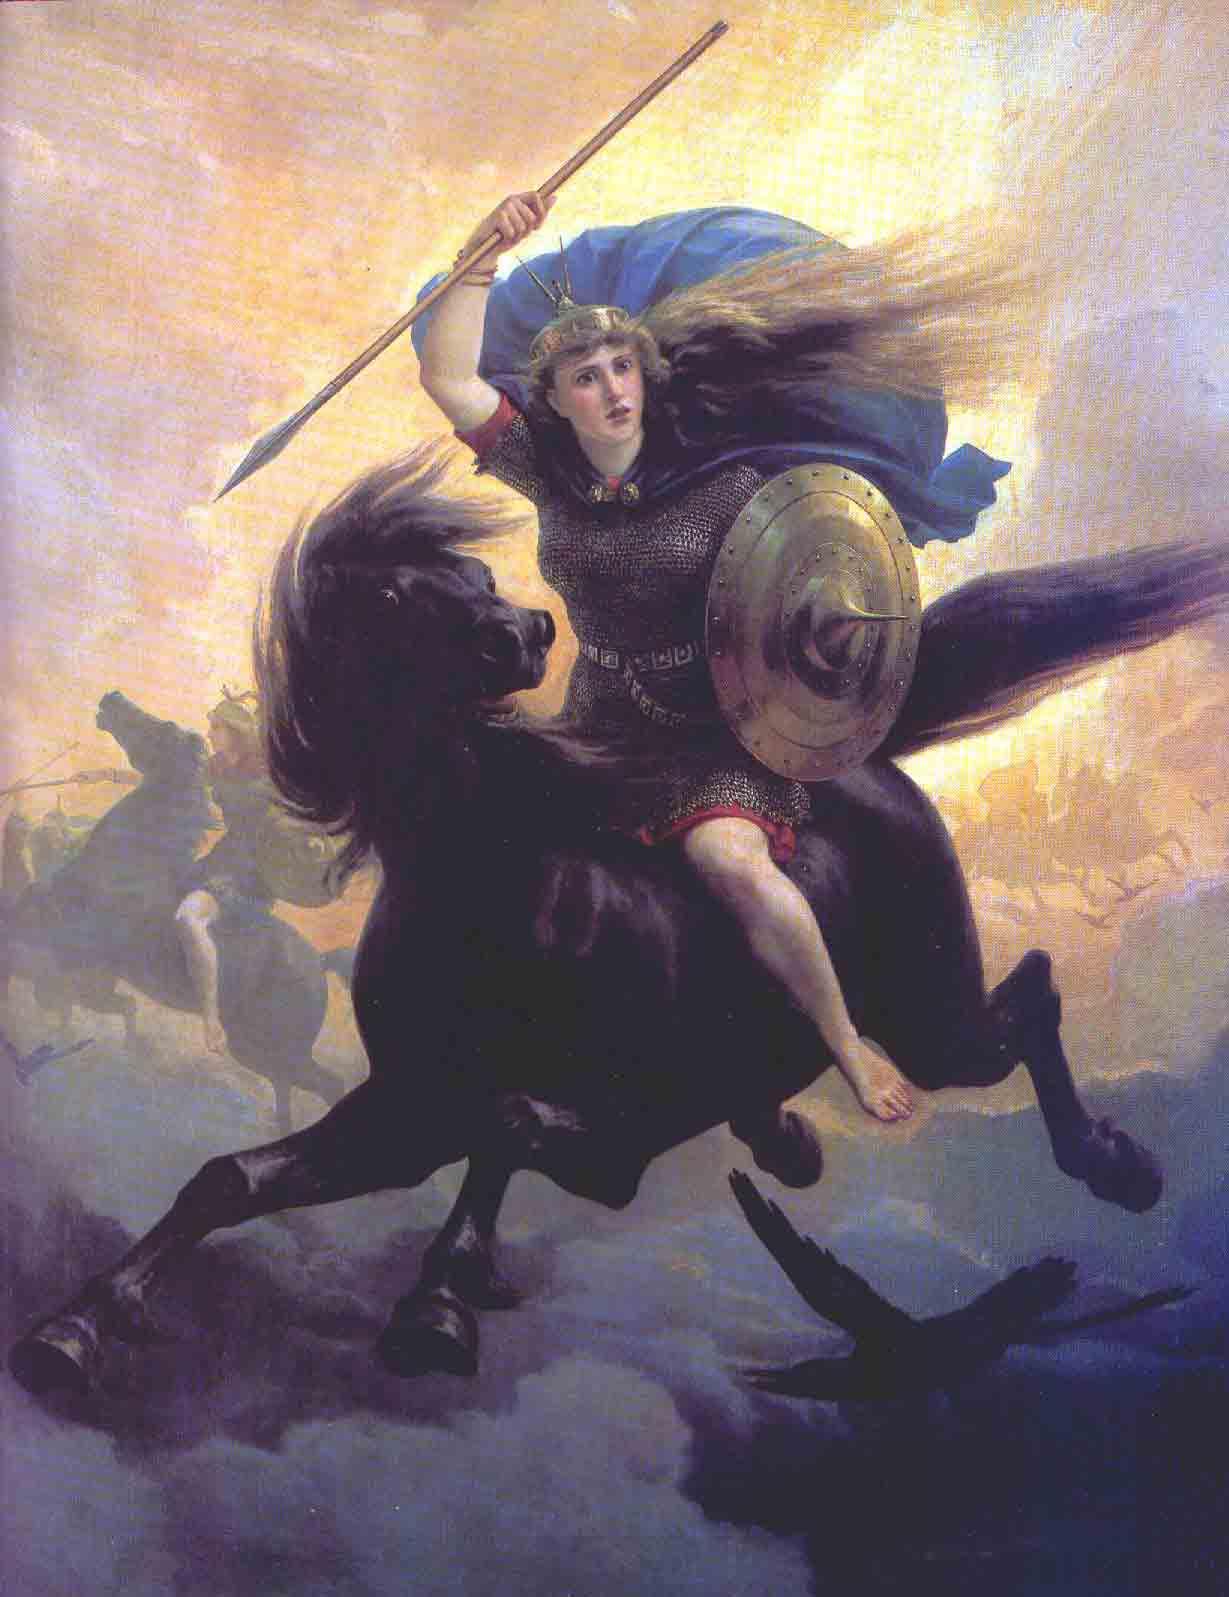 the norns of norse mythology by g lee on prezi